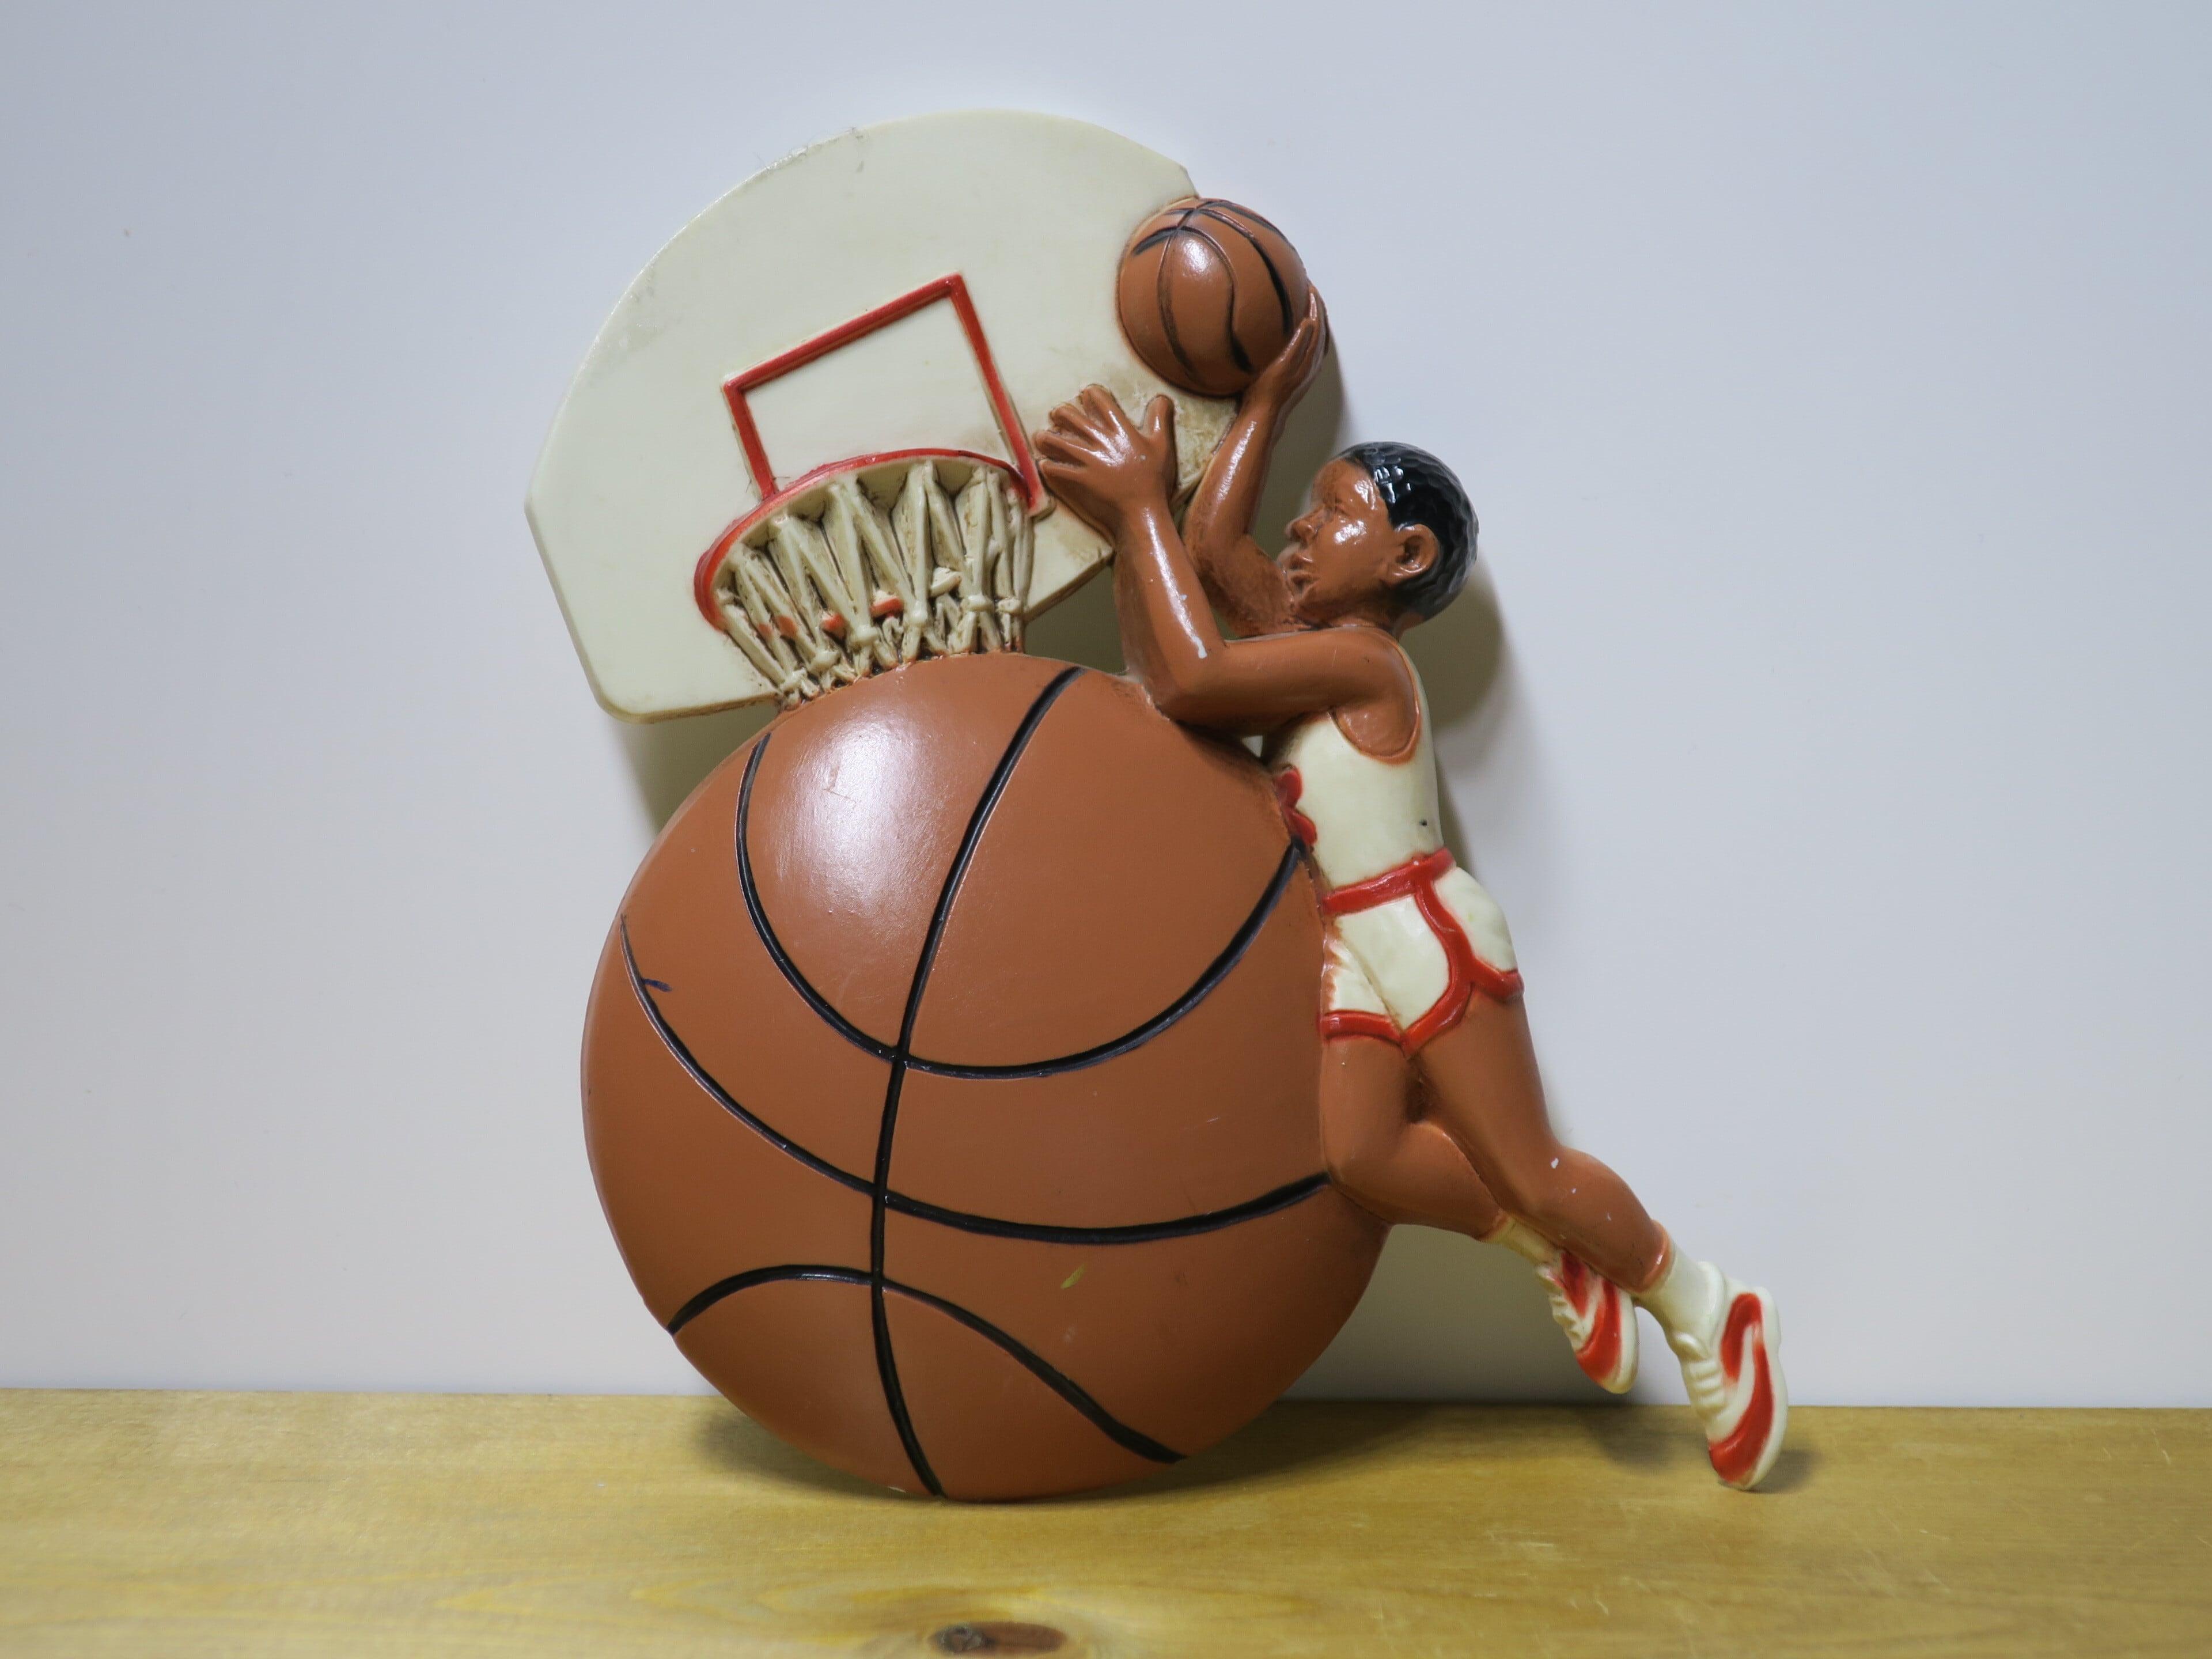 BURWOOD 壁掛け バスケットボール